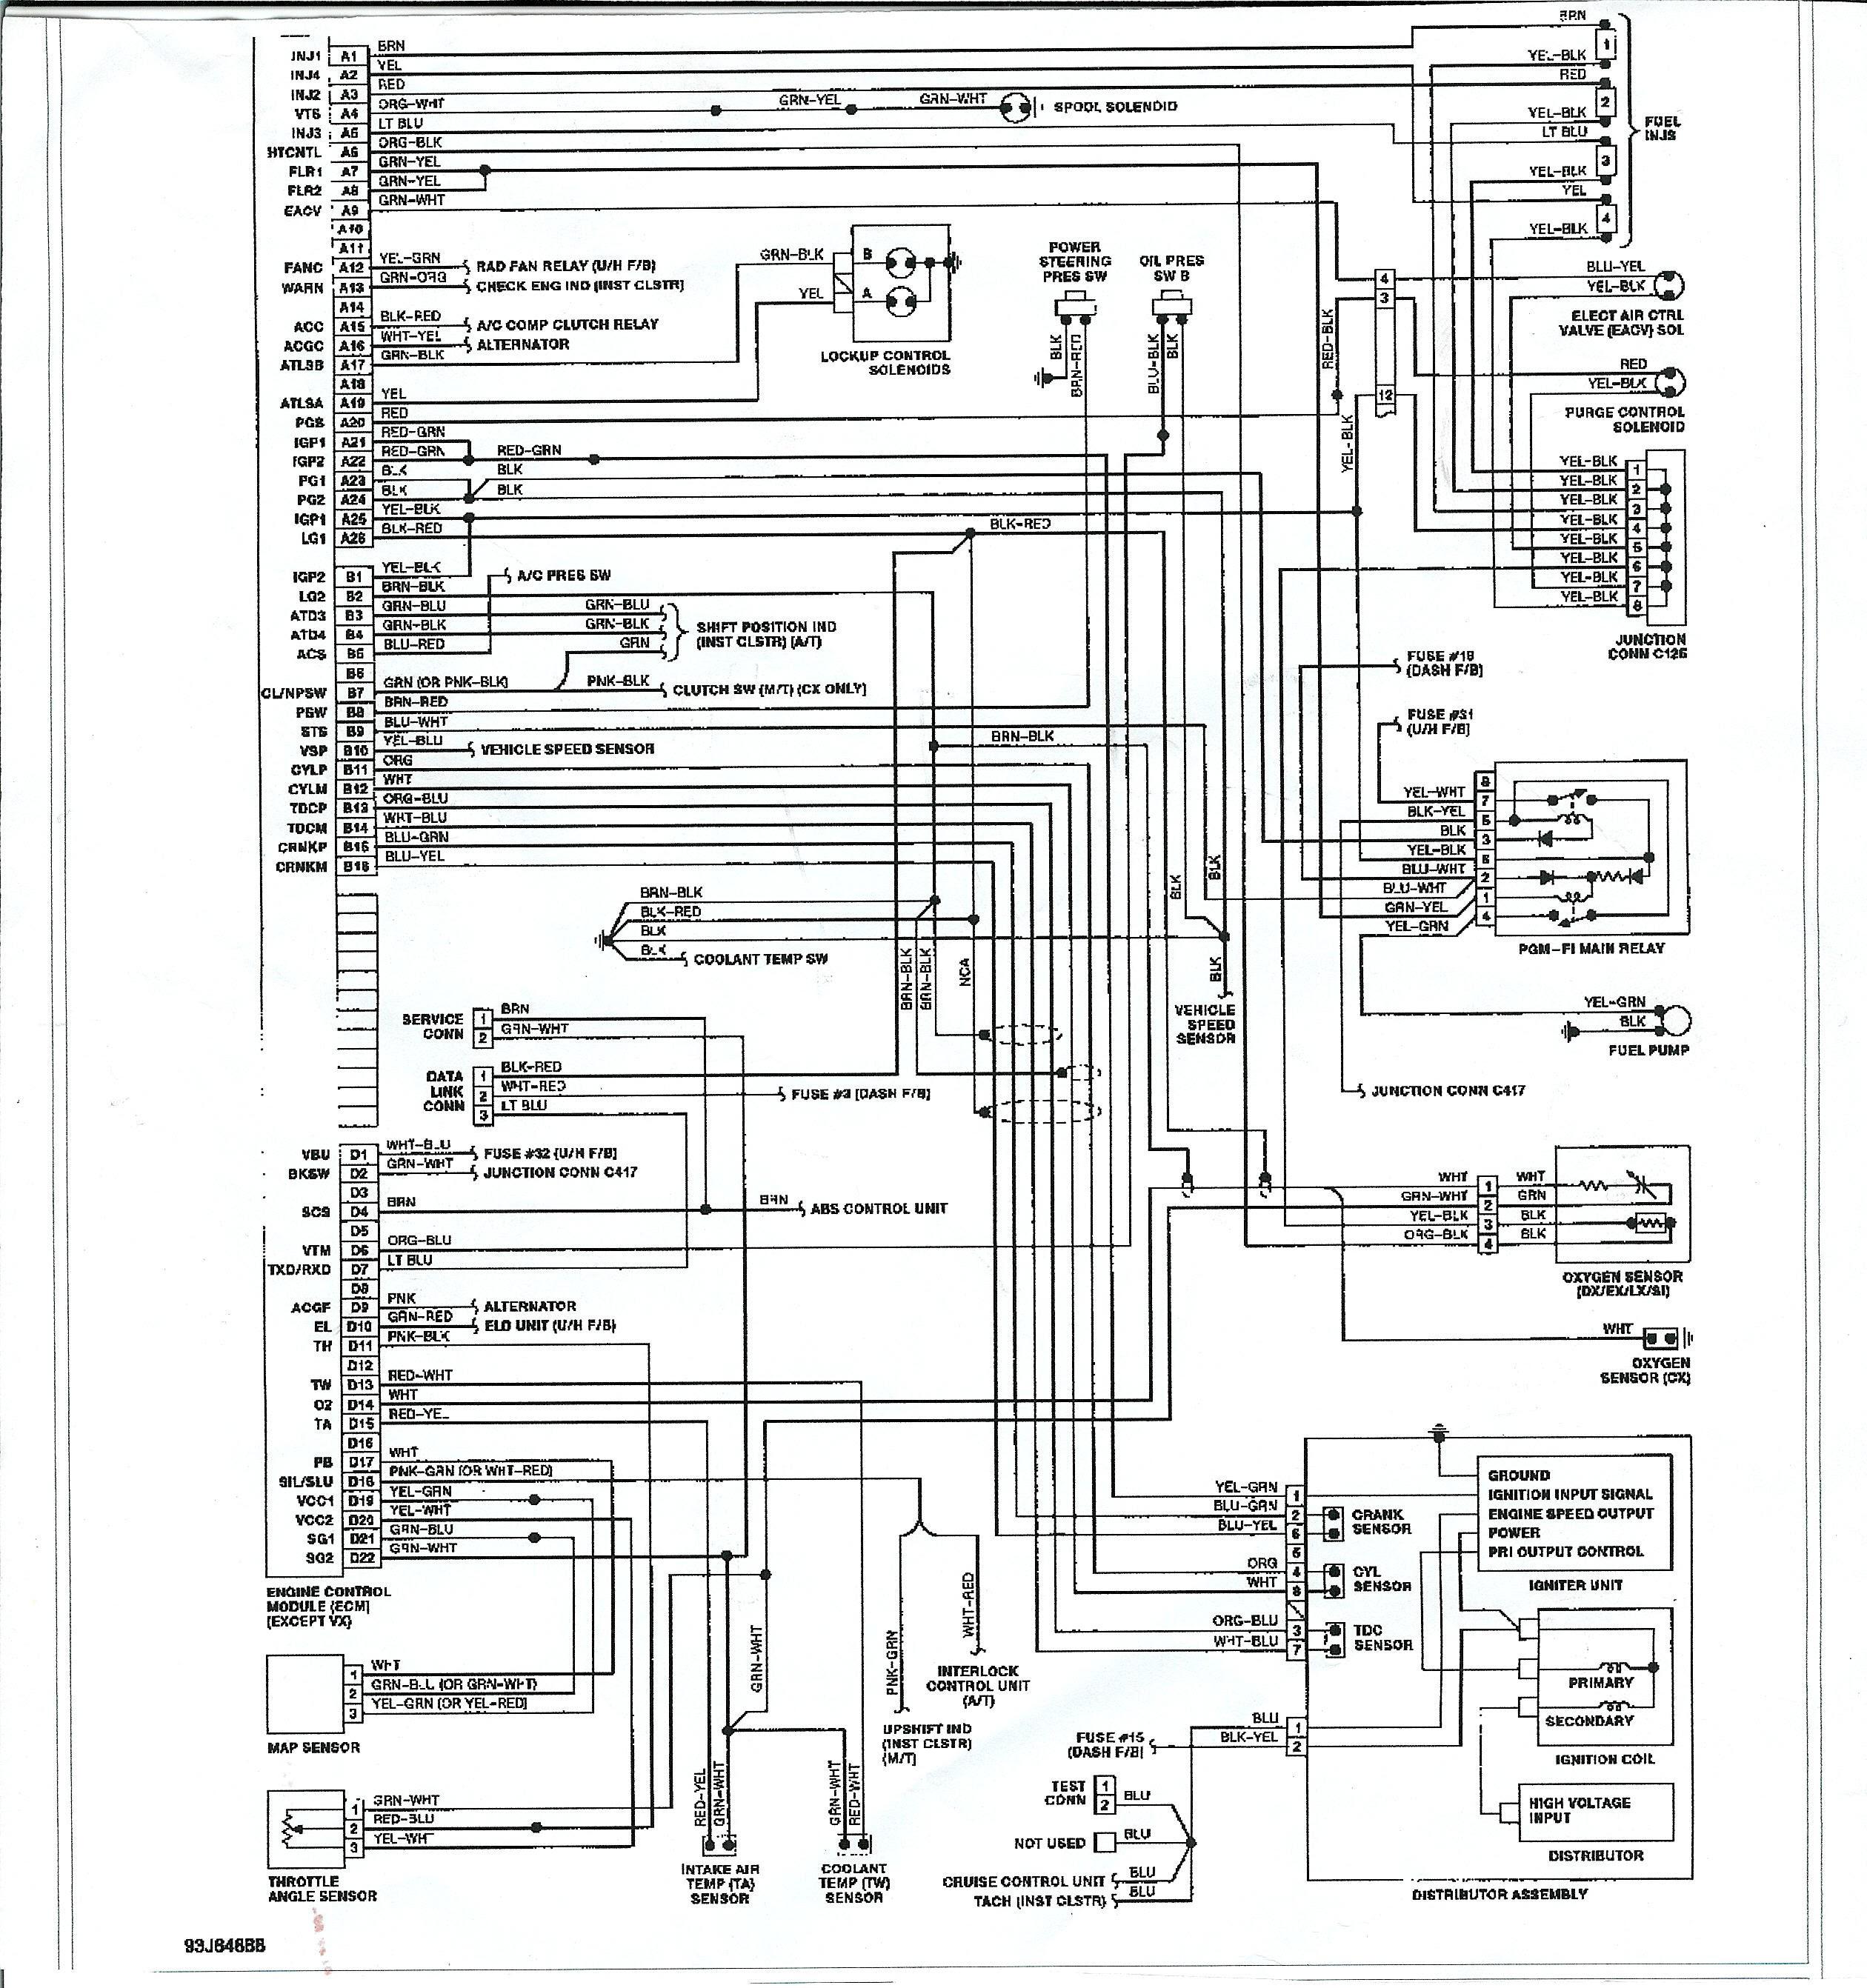 1990 Honda Civic Ex Wiring Diagram Bmw Factory Stereo Wiring Diagrams 2001 Begeboy Wiring Diagram Source